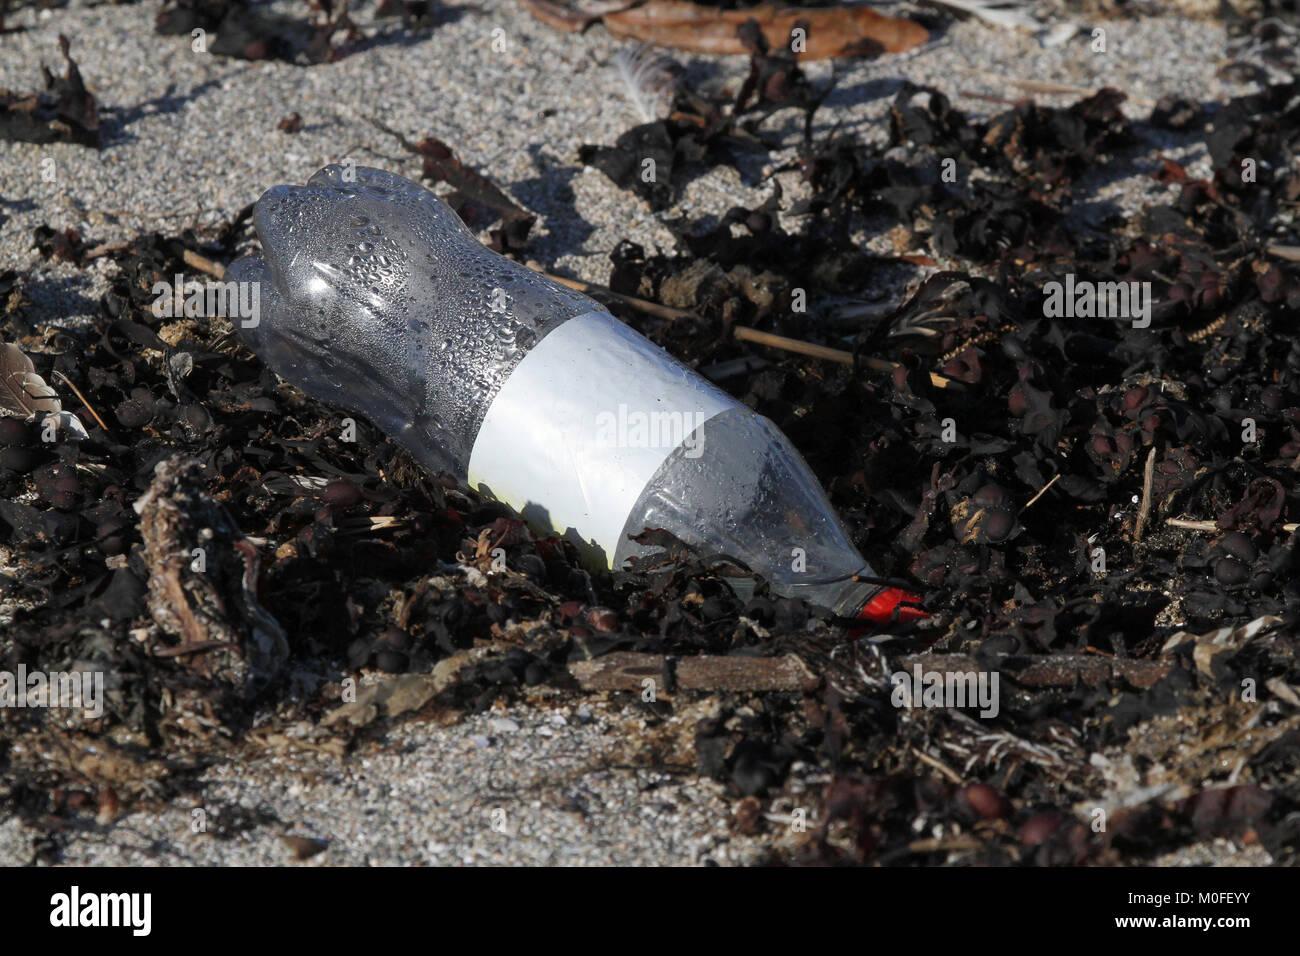 Plastic soft drink bottle on beach. Stock Photo